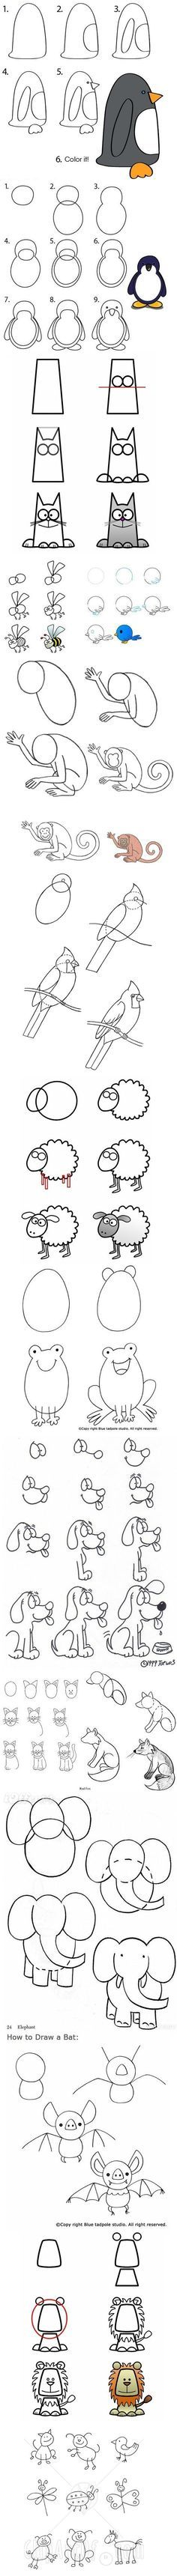 Animal drawing tutorial.